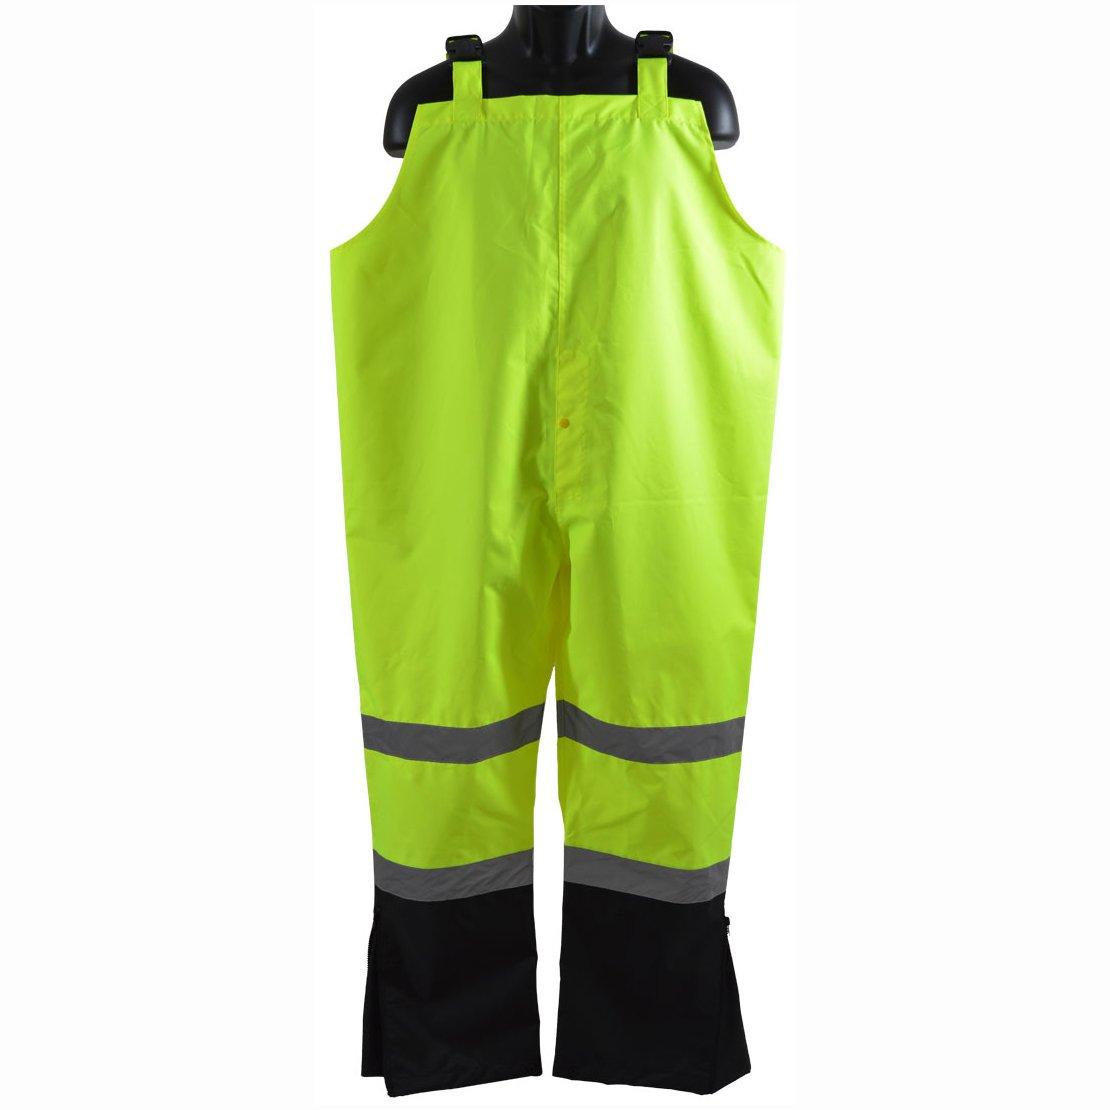 Petra Roc LBBIP-CE-5X Bib Rain Pants ANSI Class E Two Tone Lime/Black 300D Oxford/PU Coating Waterproof, 5X by Petra Roc (Image #1)